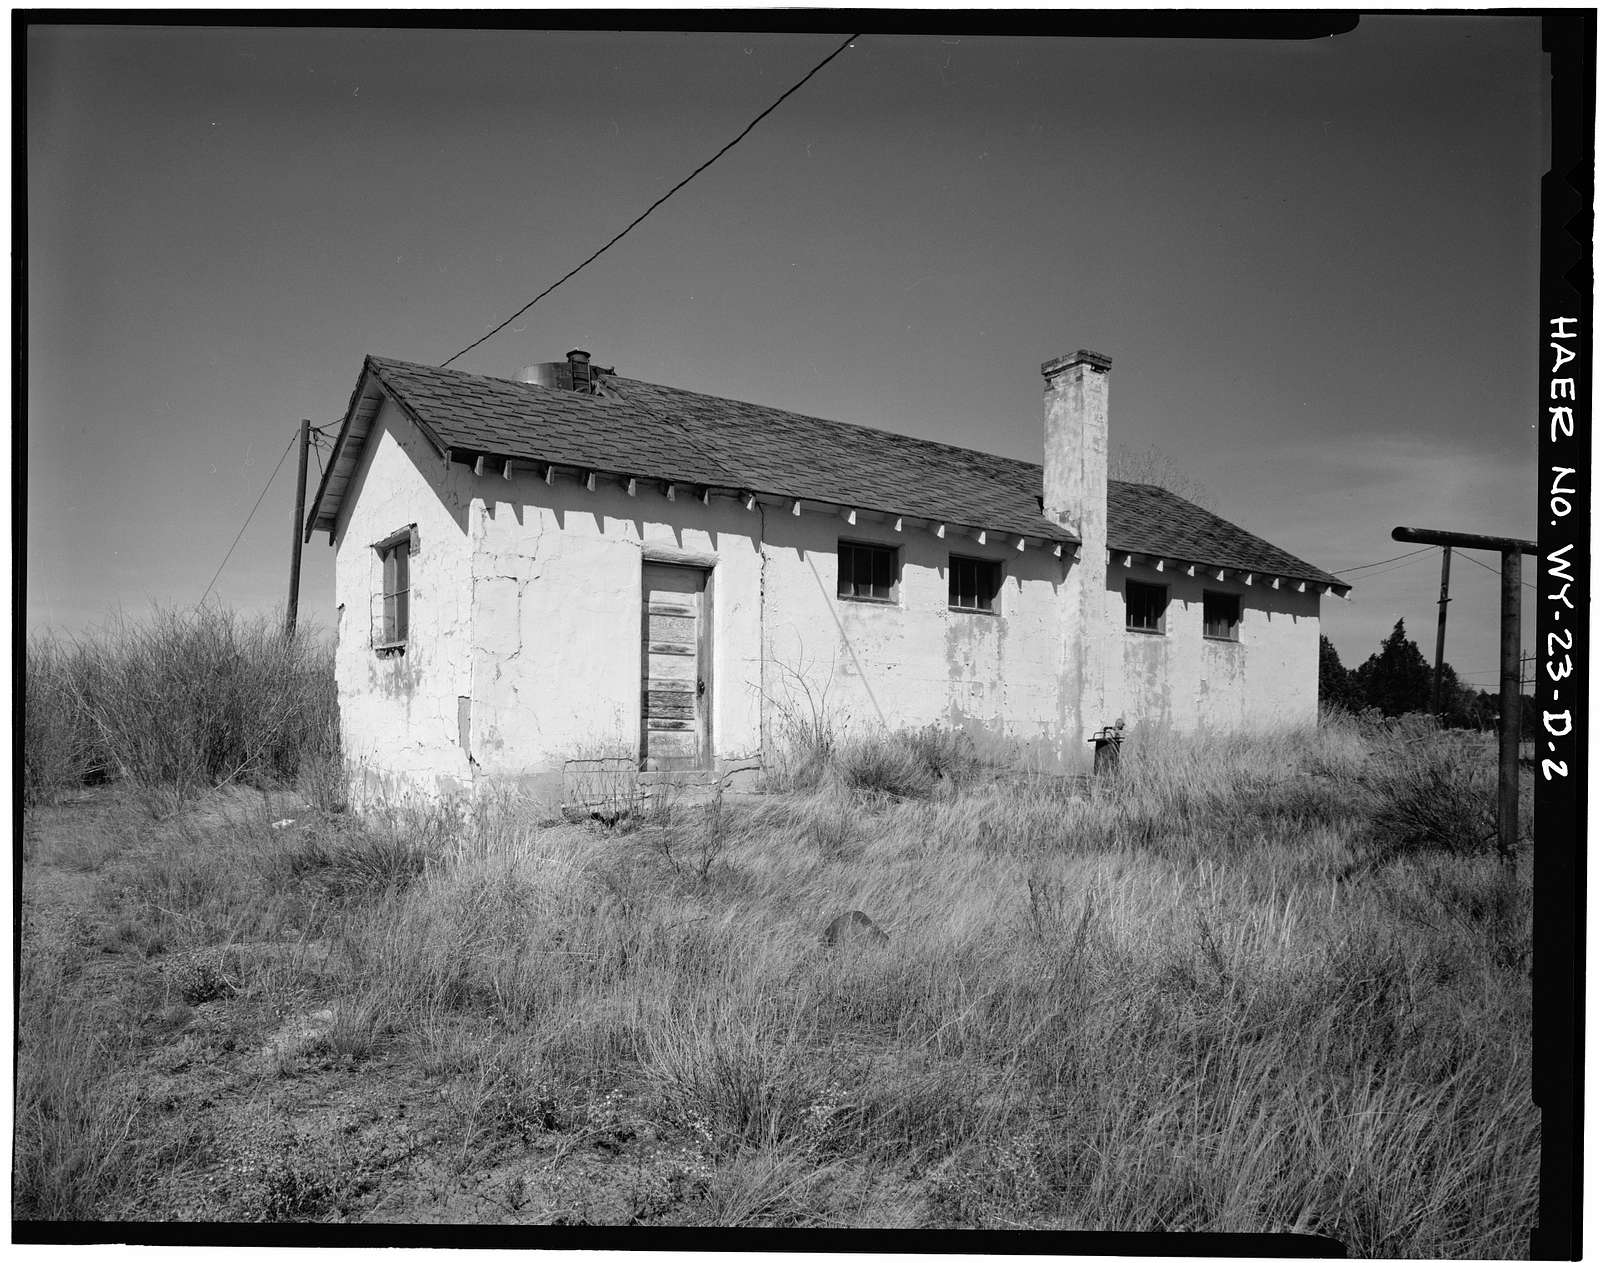 Clay Spur Bentonite Plant & Camp, Bath House, Clay Spur Siding on Burlington Northern Railroad, Osage, Weston County, WY